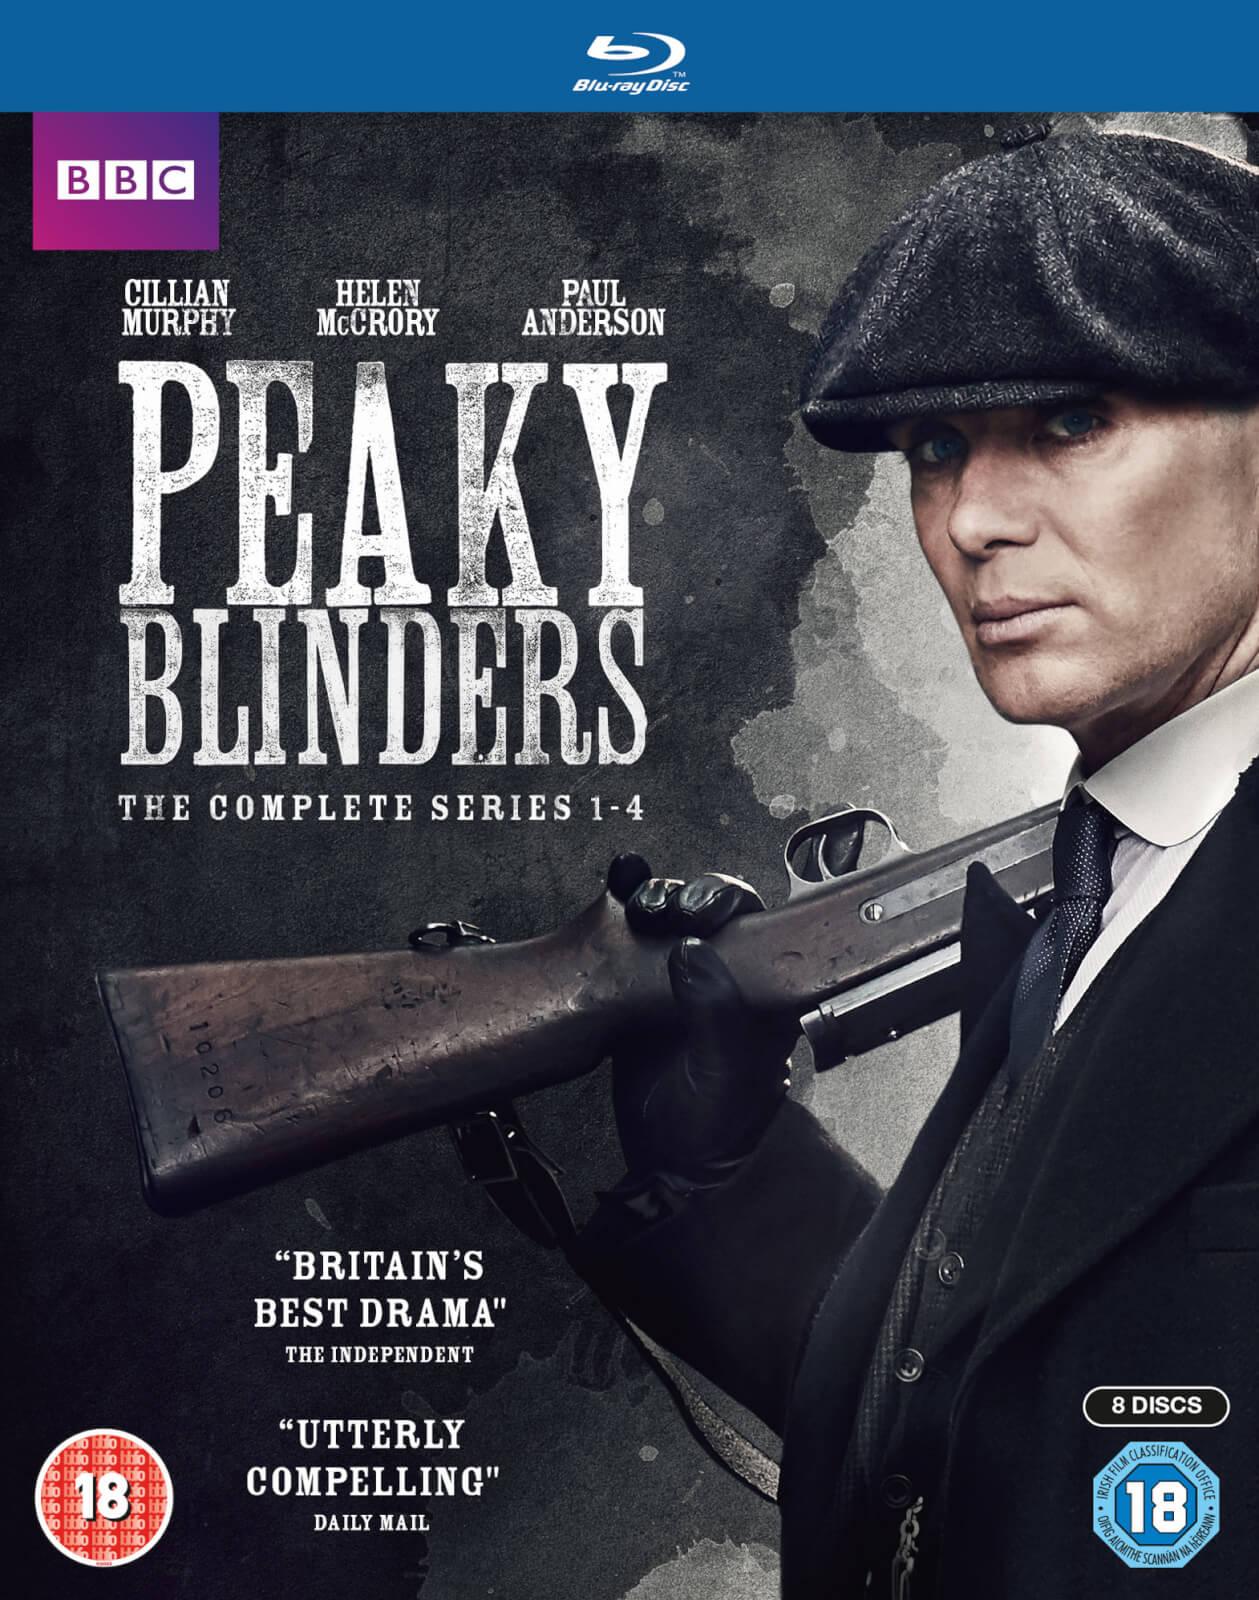 BBC Peaky Blinders - Series 1-4 Boxset